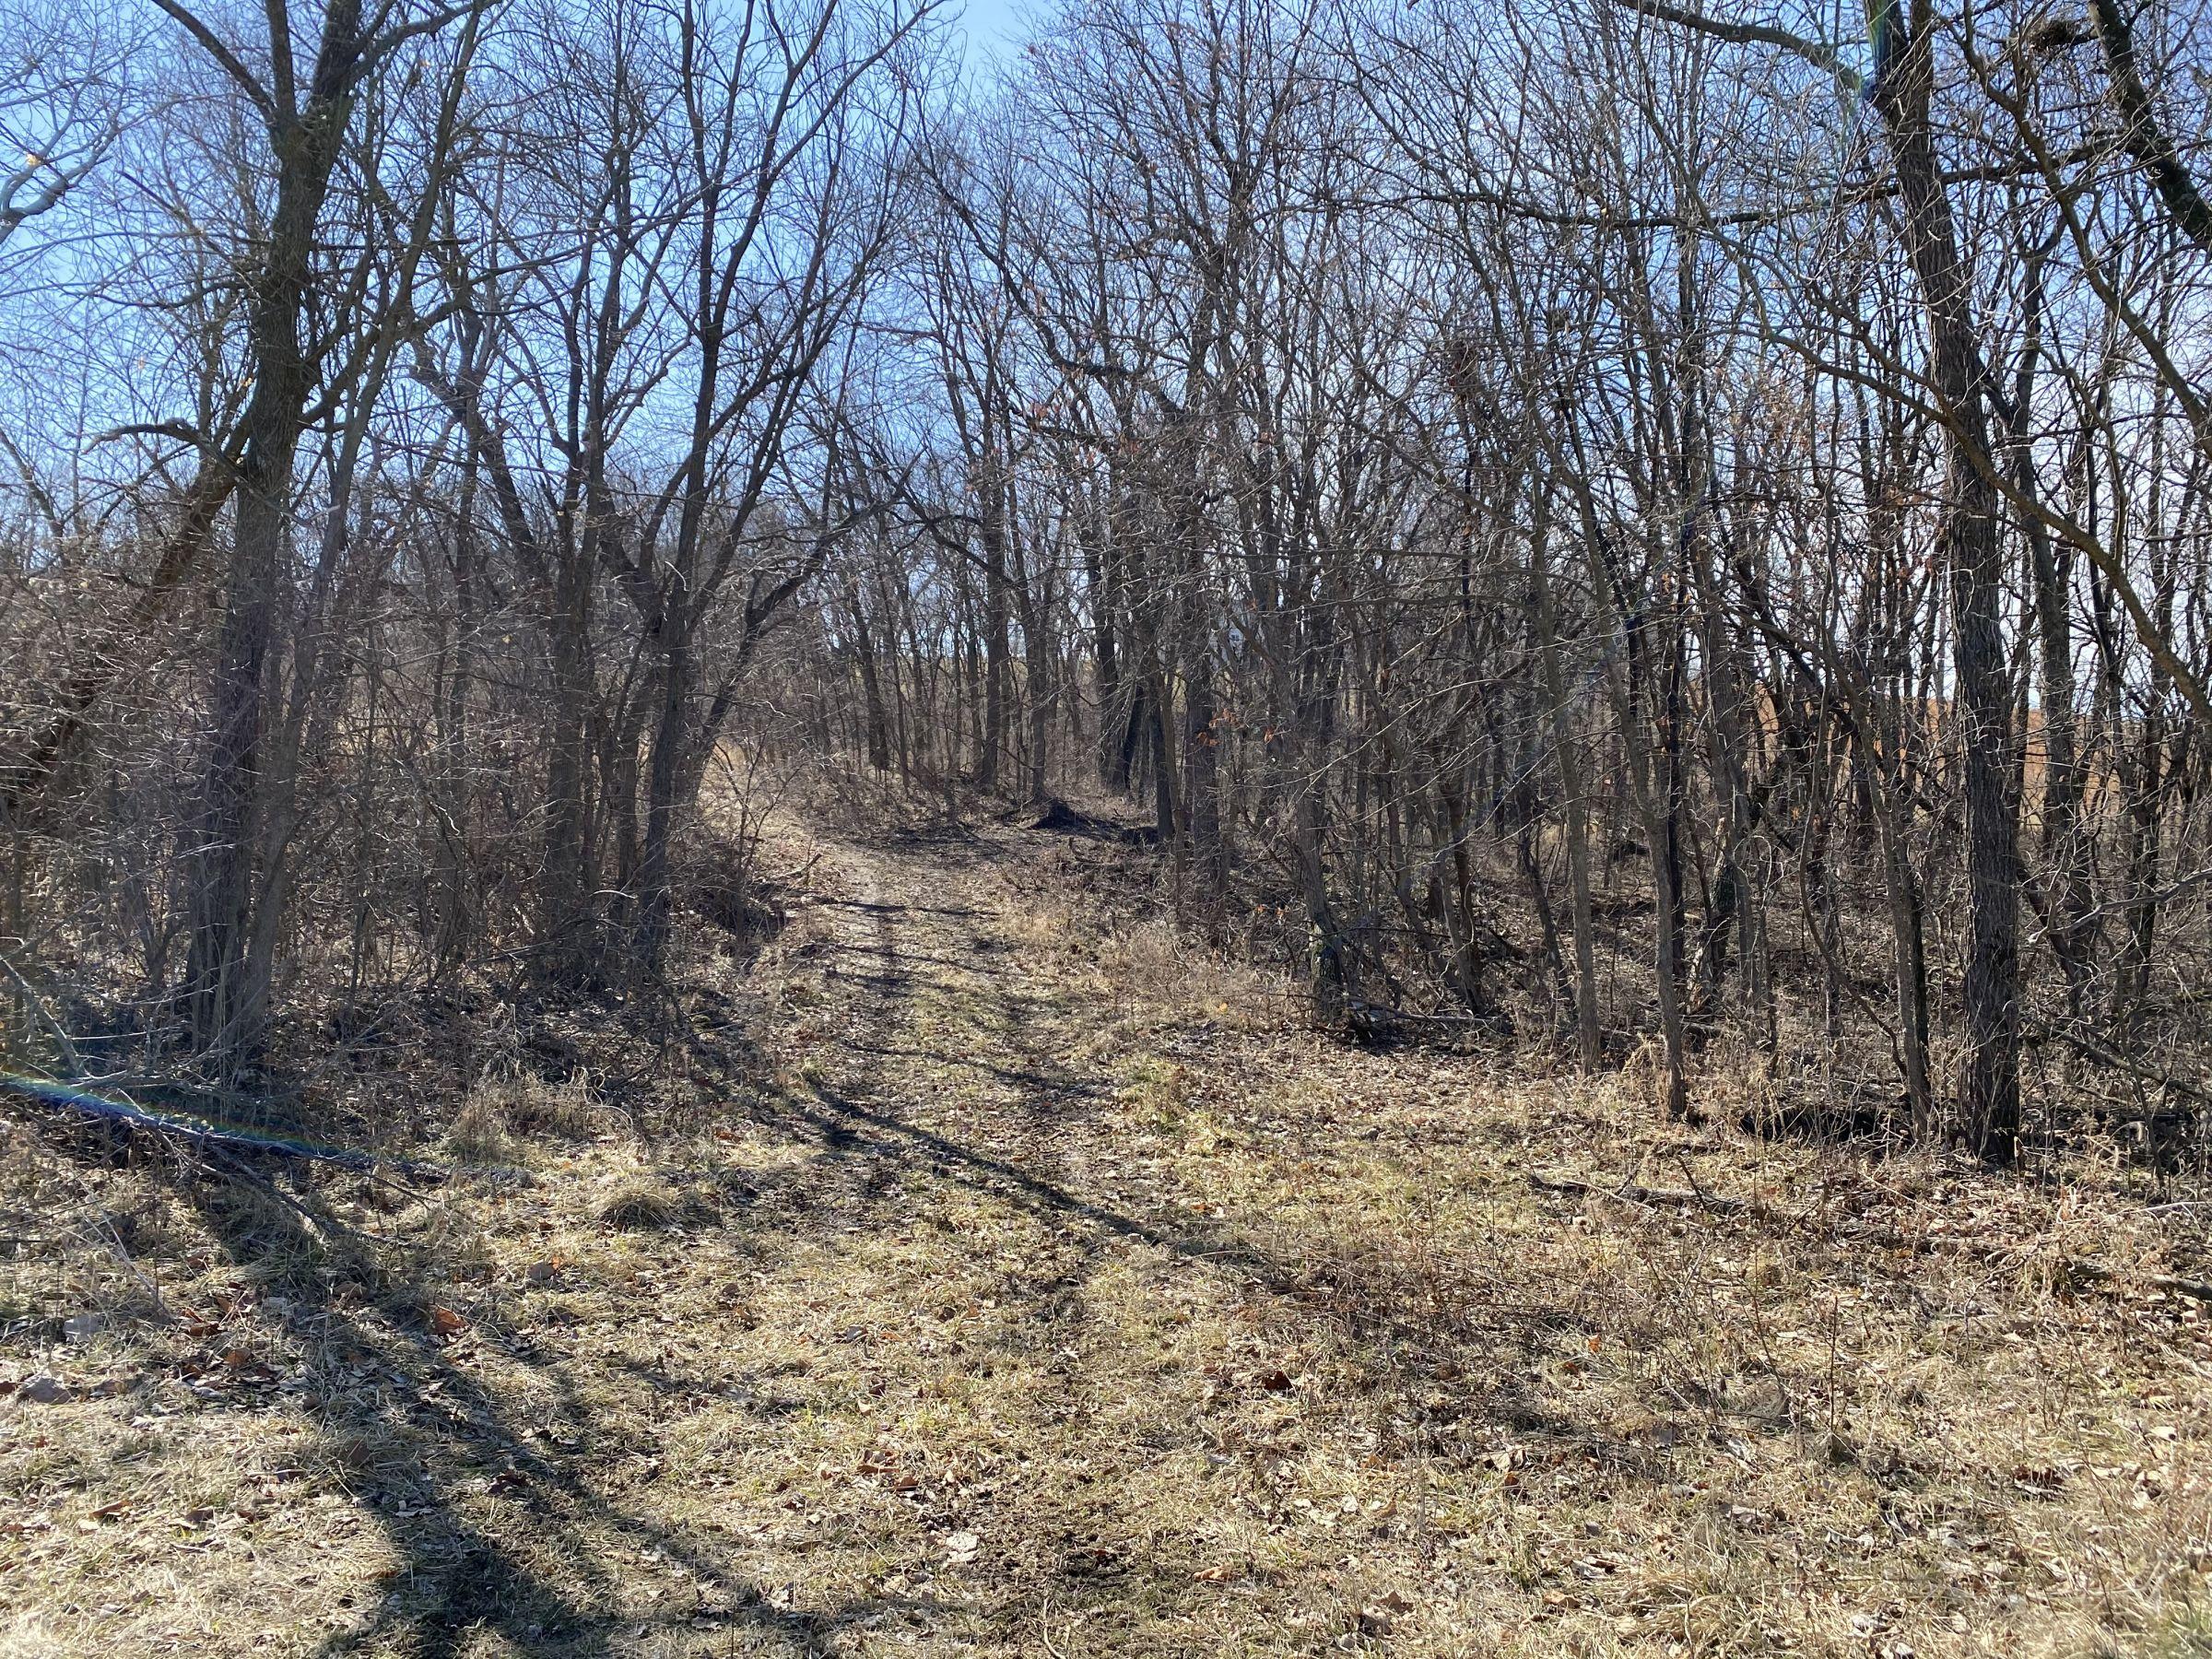 land-warren-county-iowa-112-acres-listing-number-15404-2-2021-03-12-151133.jpg